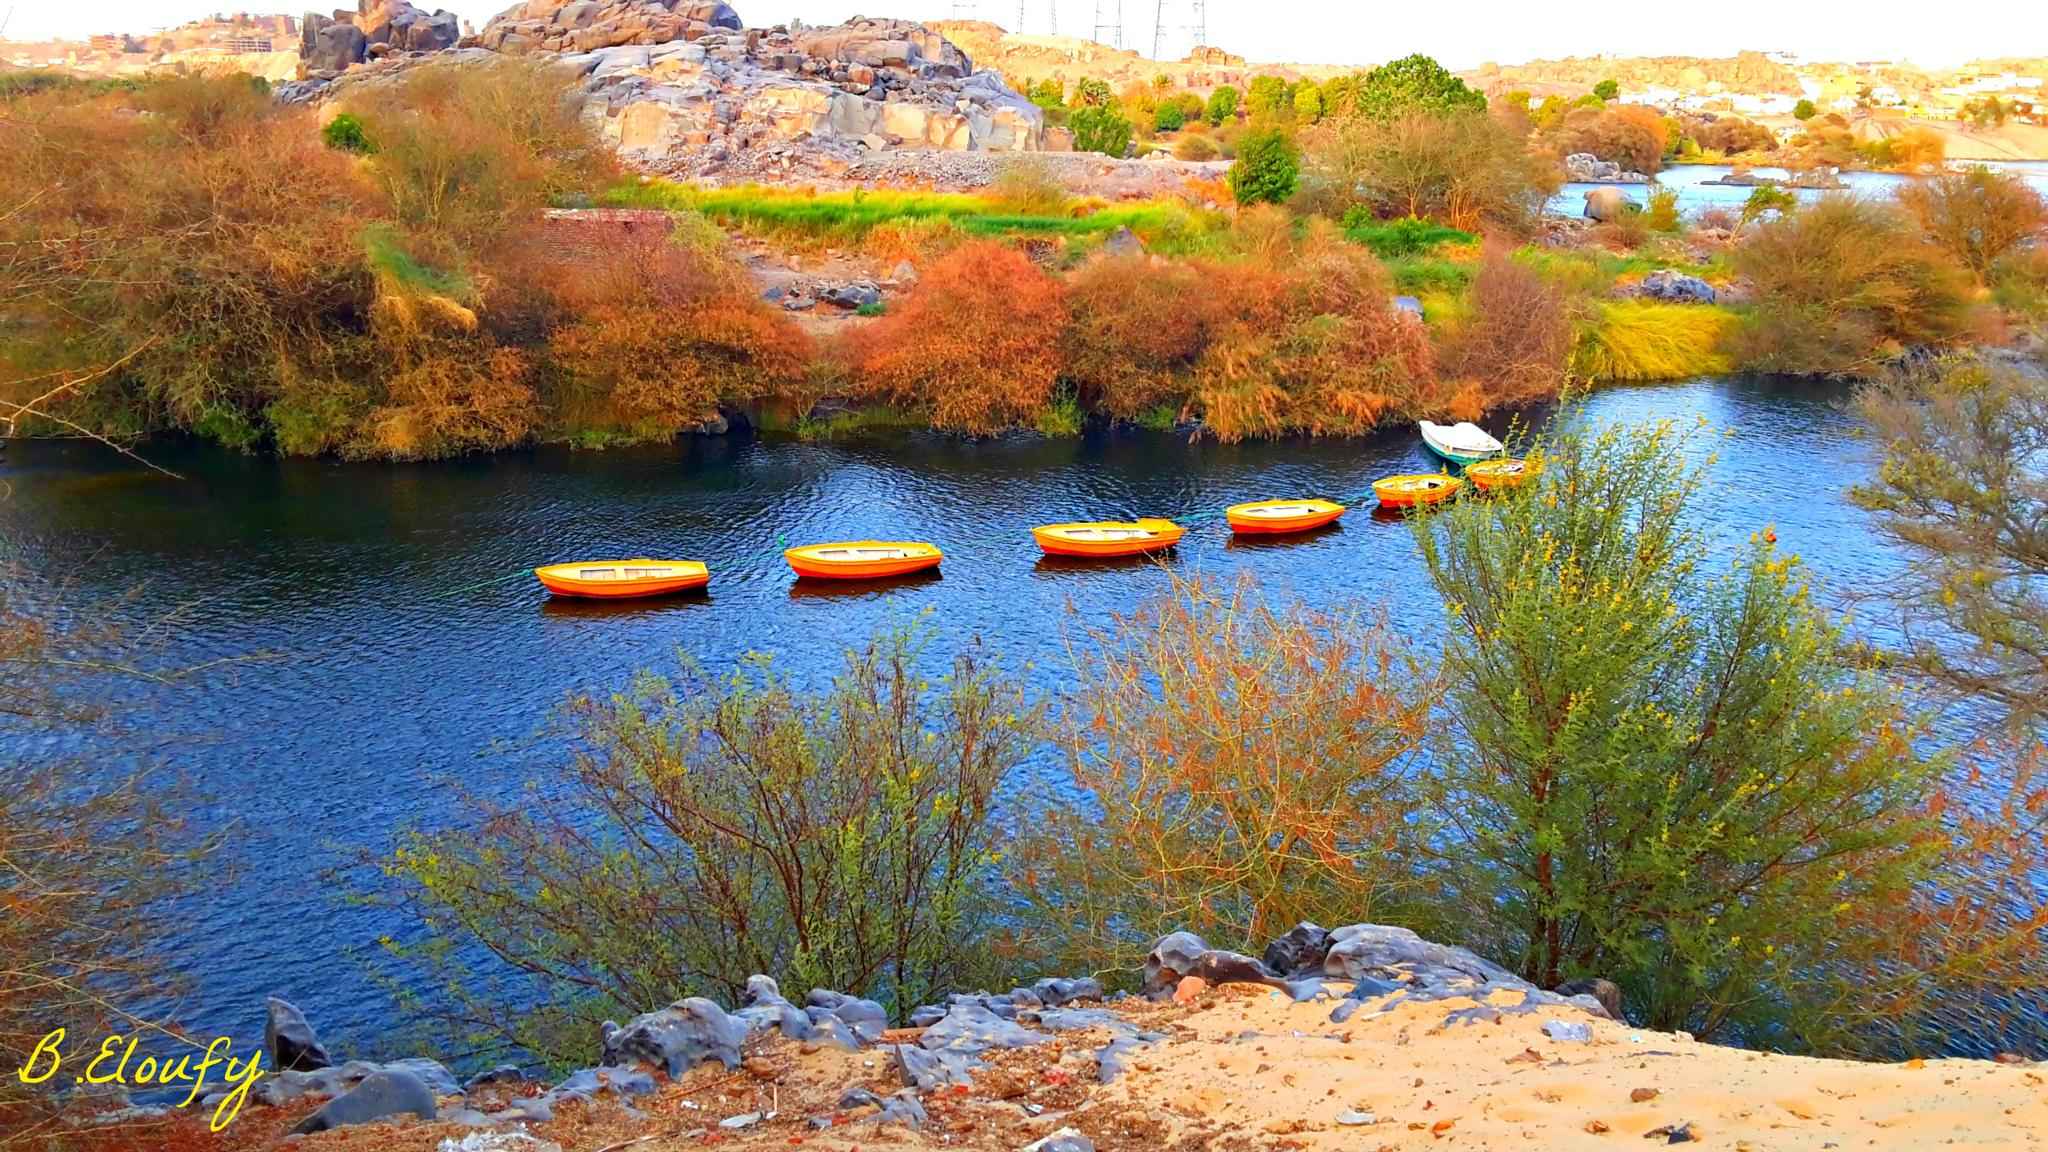 little boats  by BasmaEloufy